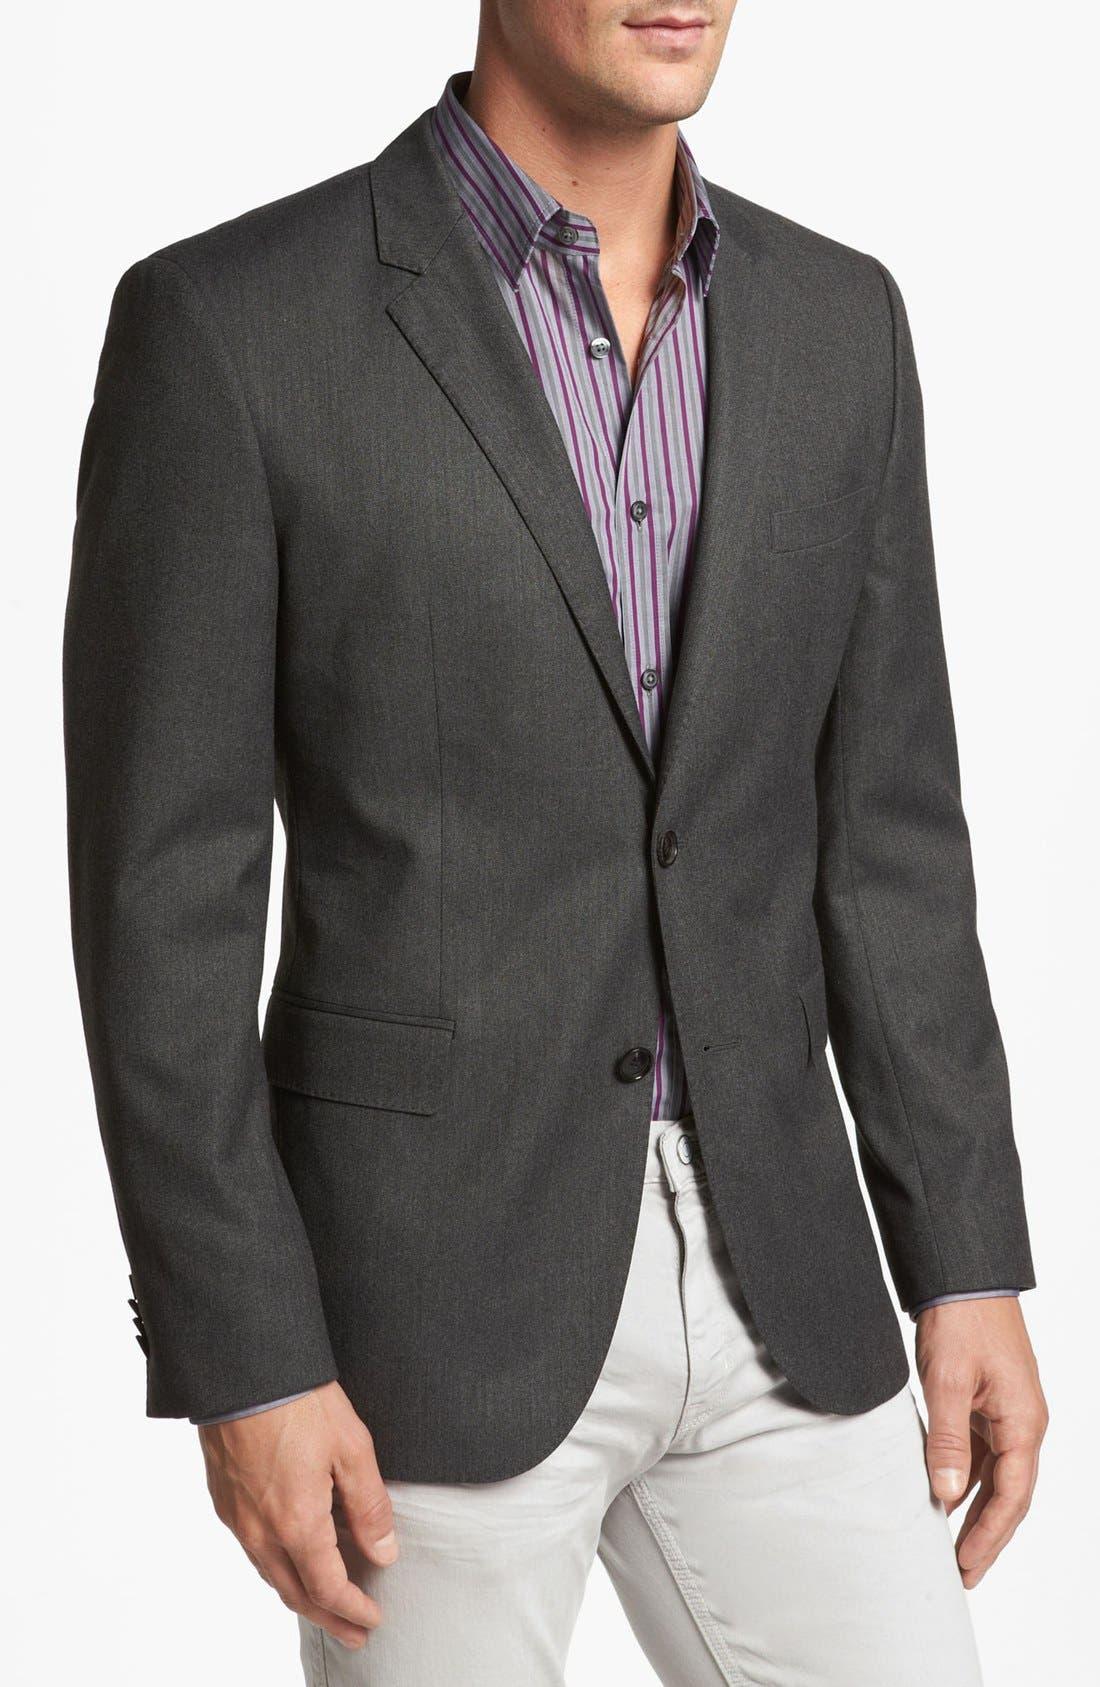 Alternate Image 1 Selected - BOSS HUGO BOSS 'Coastes' Trim Fit Sportcoat